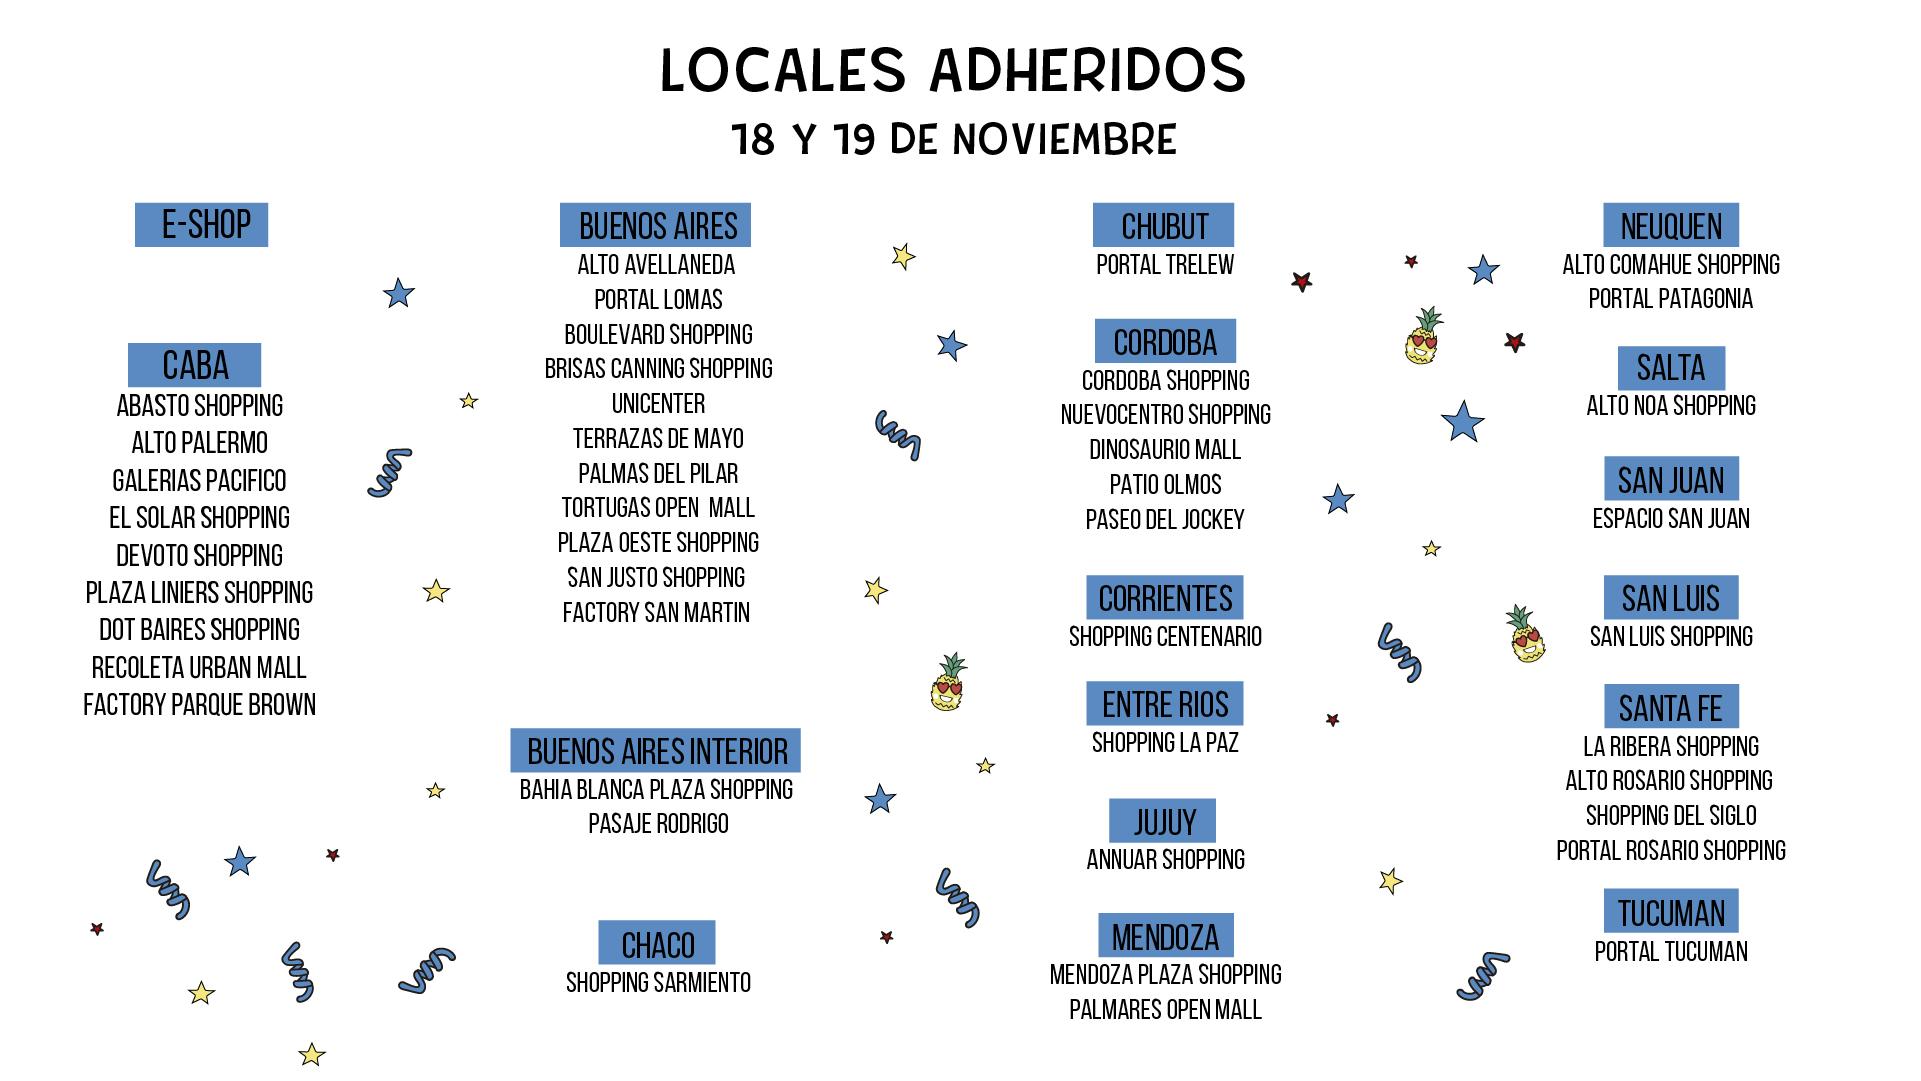 Locales Adheridos 2x1